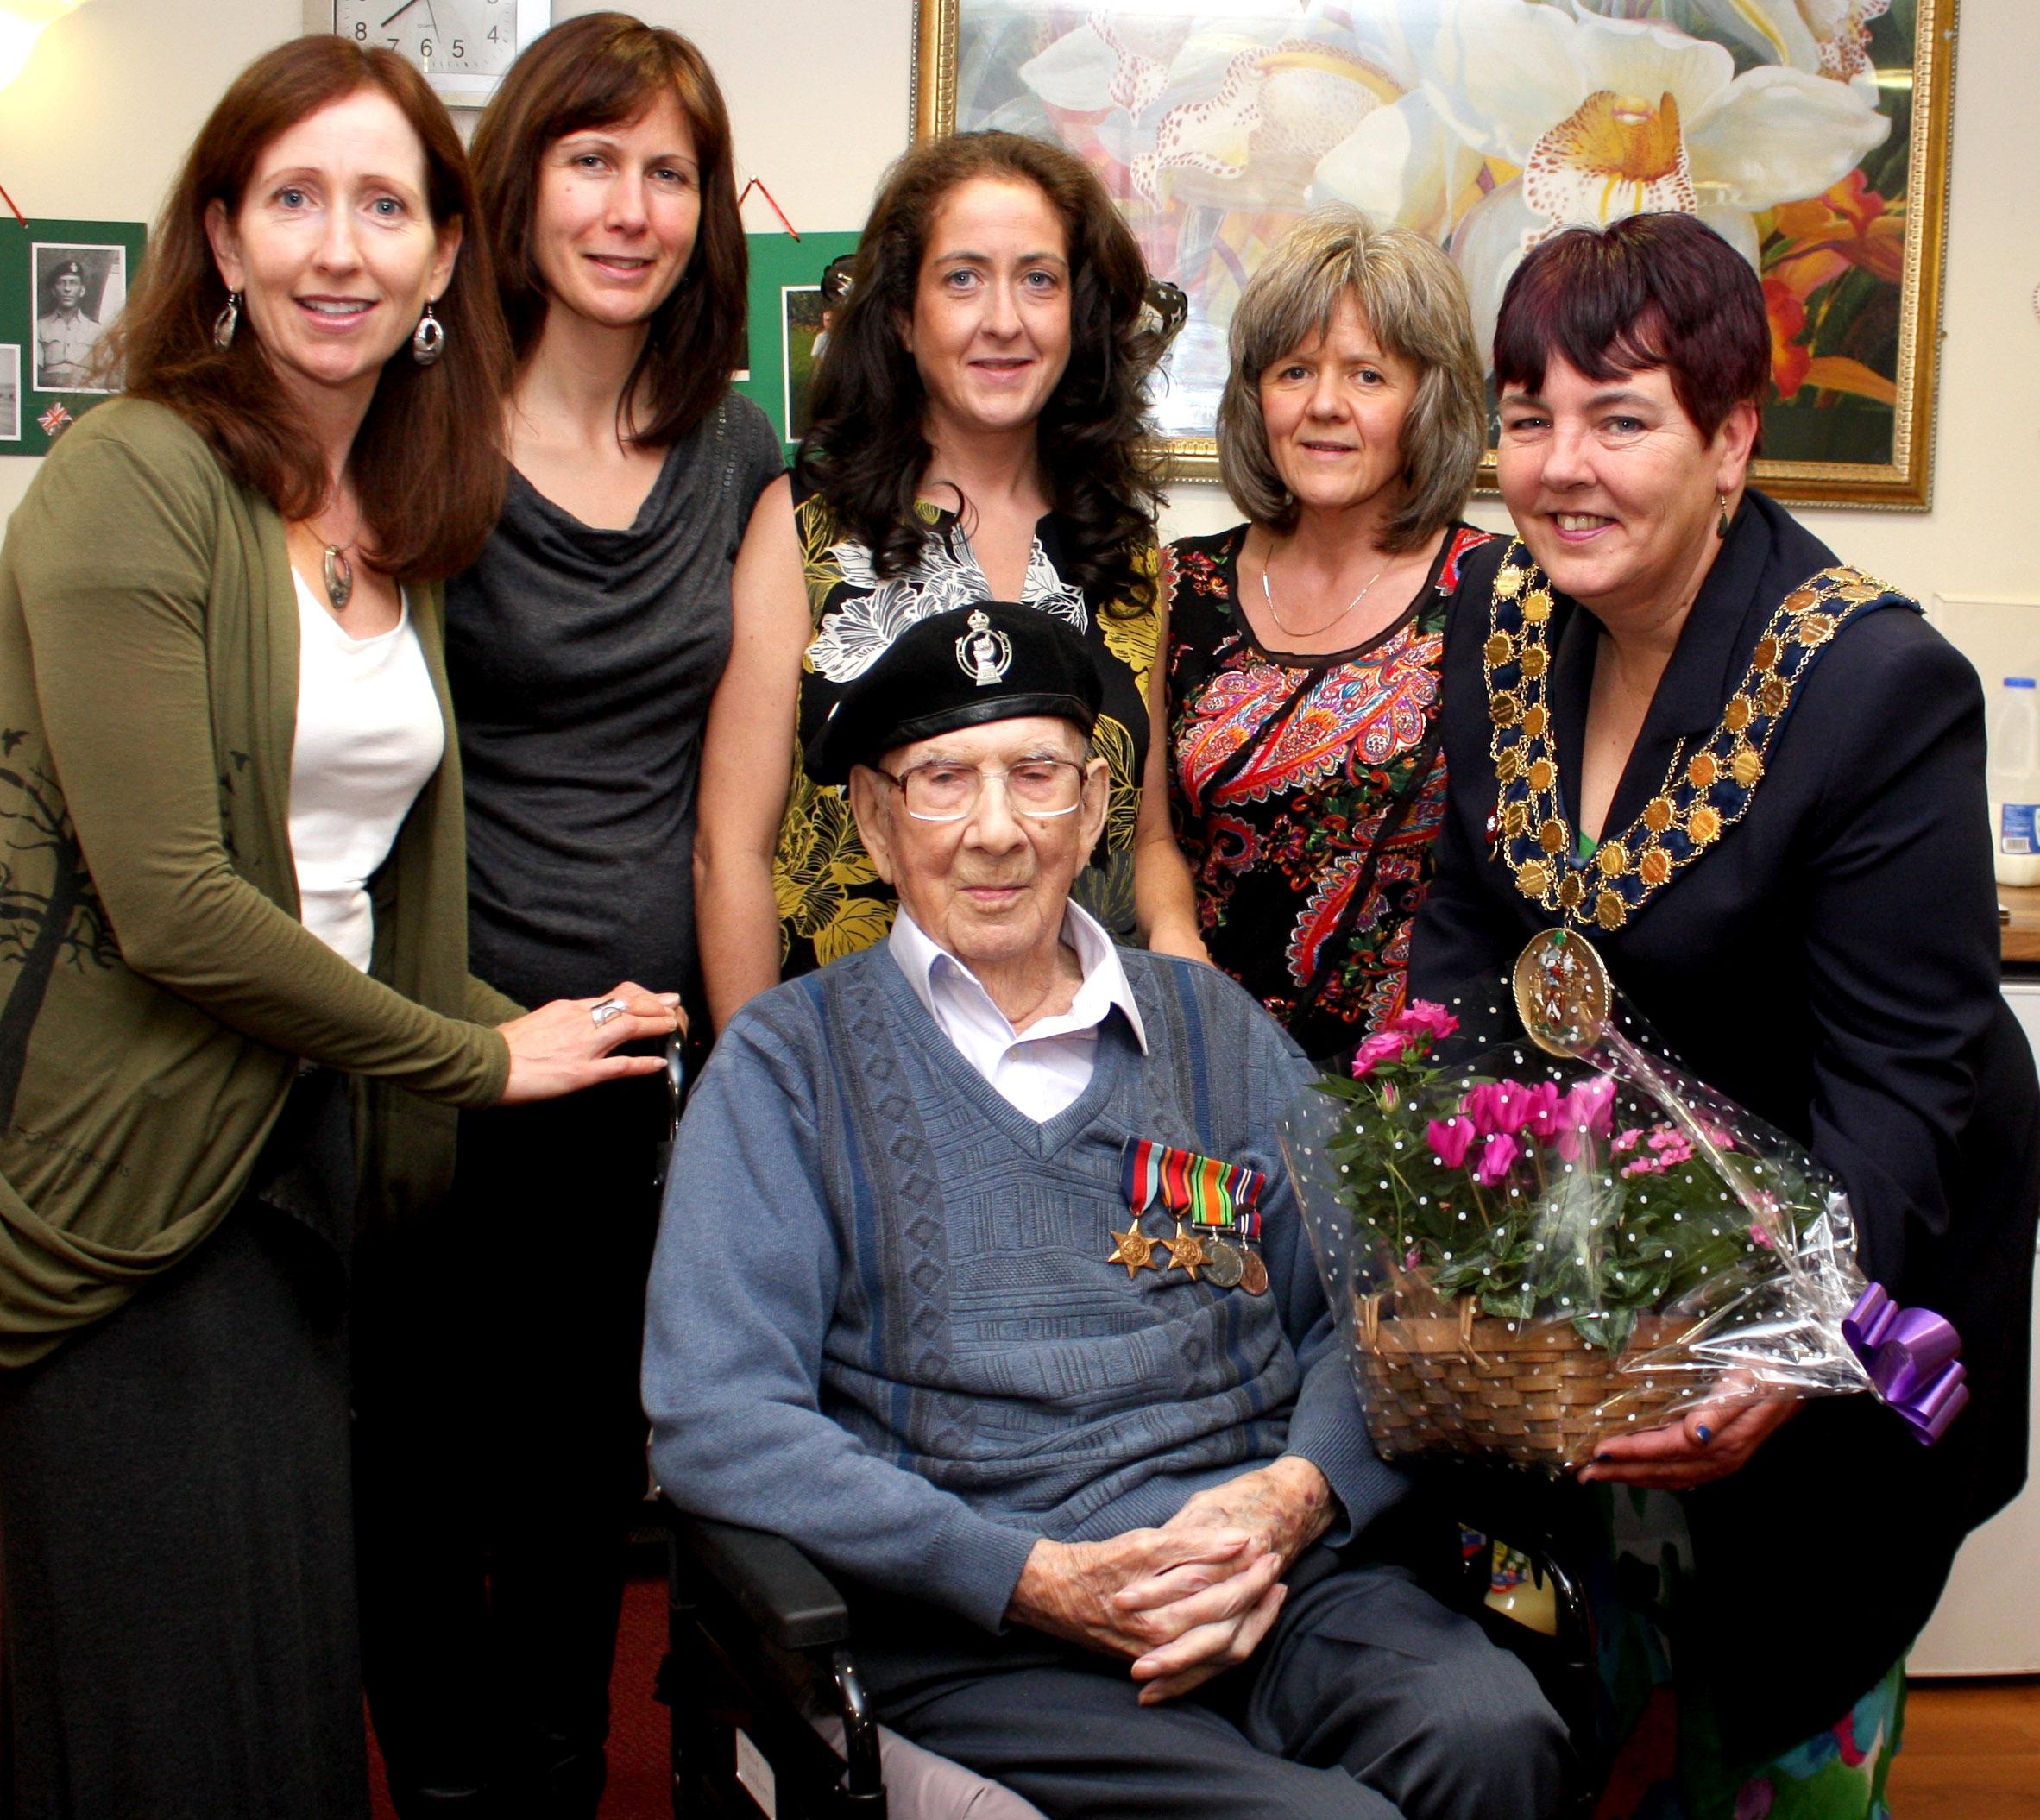 Les Celebrates His 100th